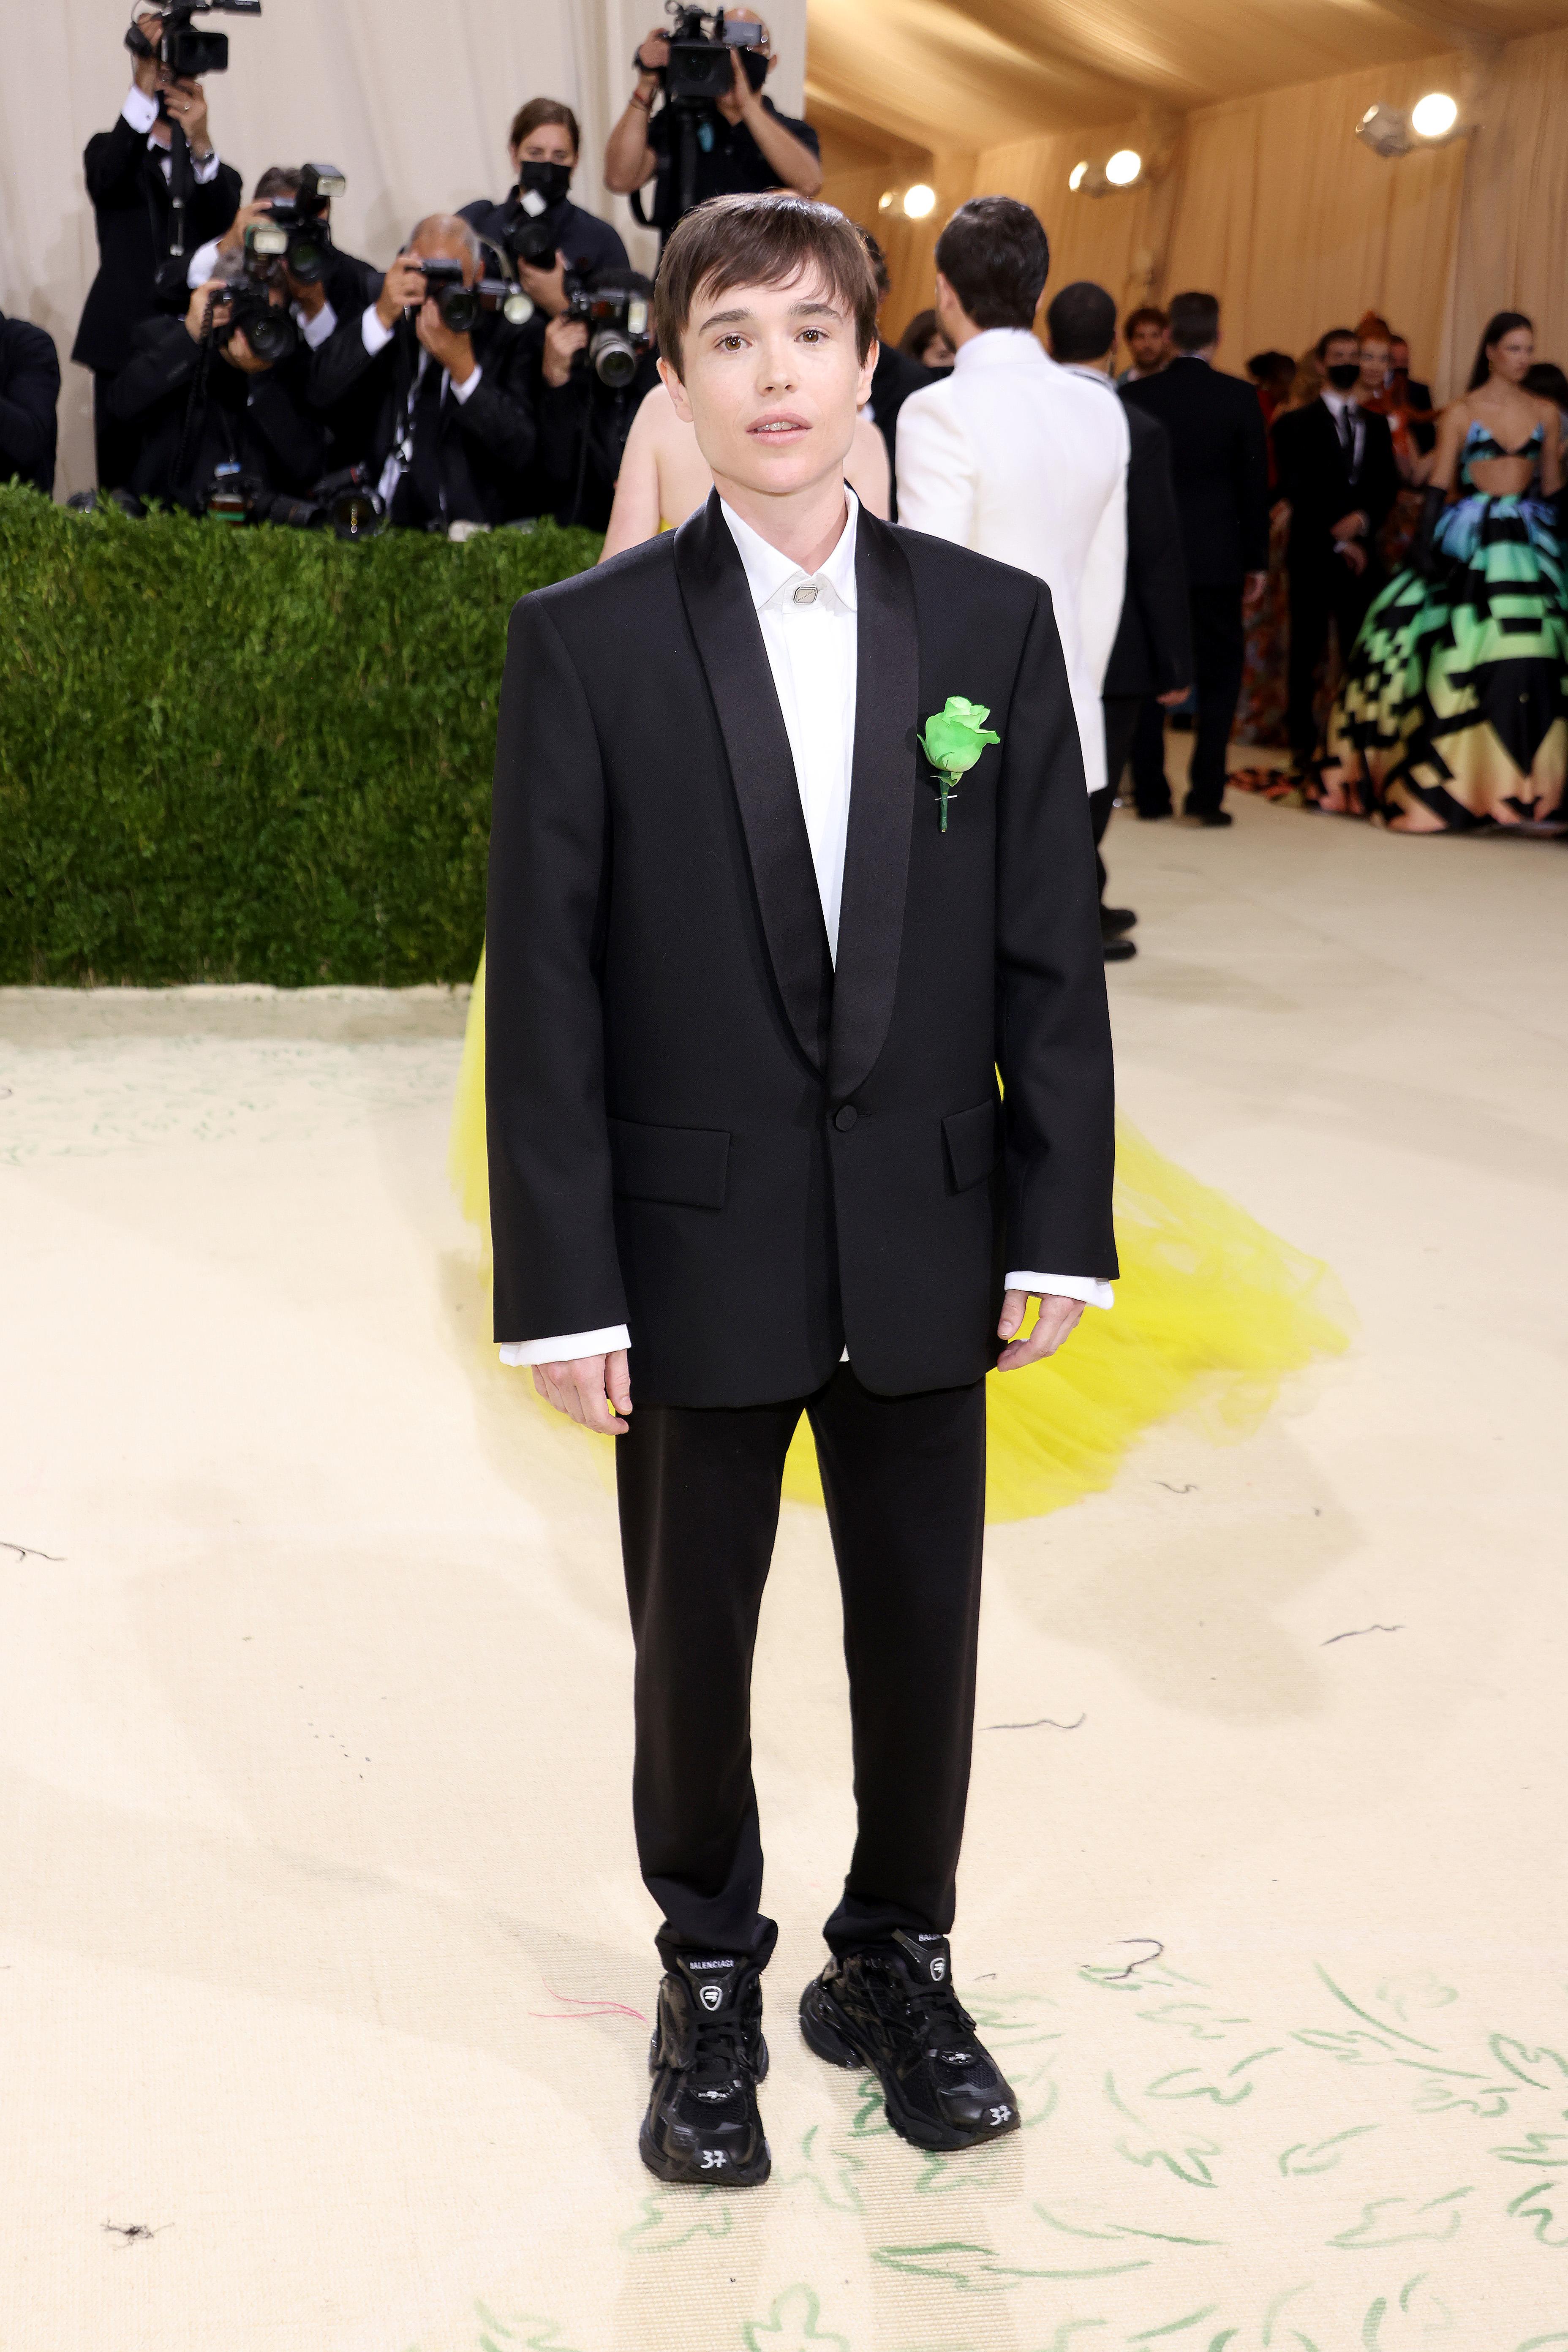 Elliot Page arrives at the Met Gala